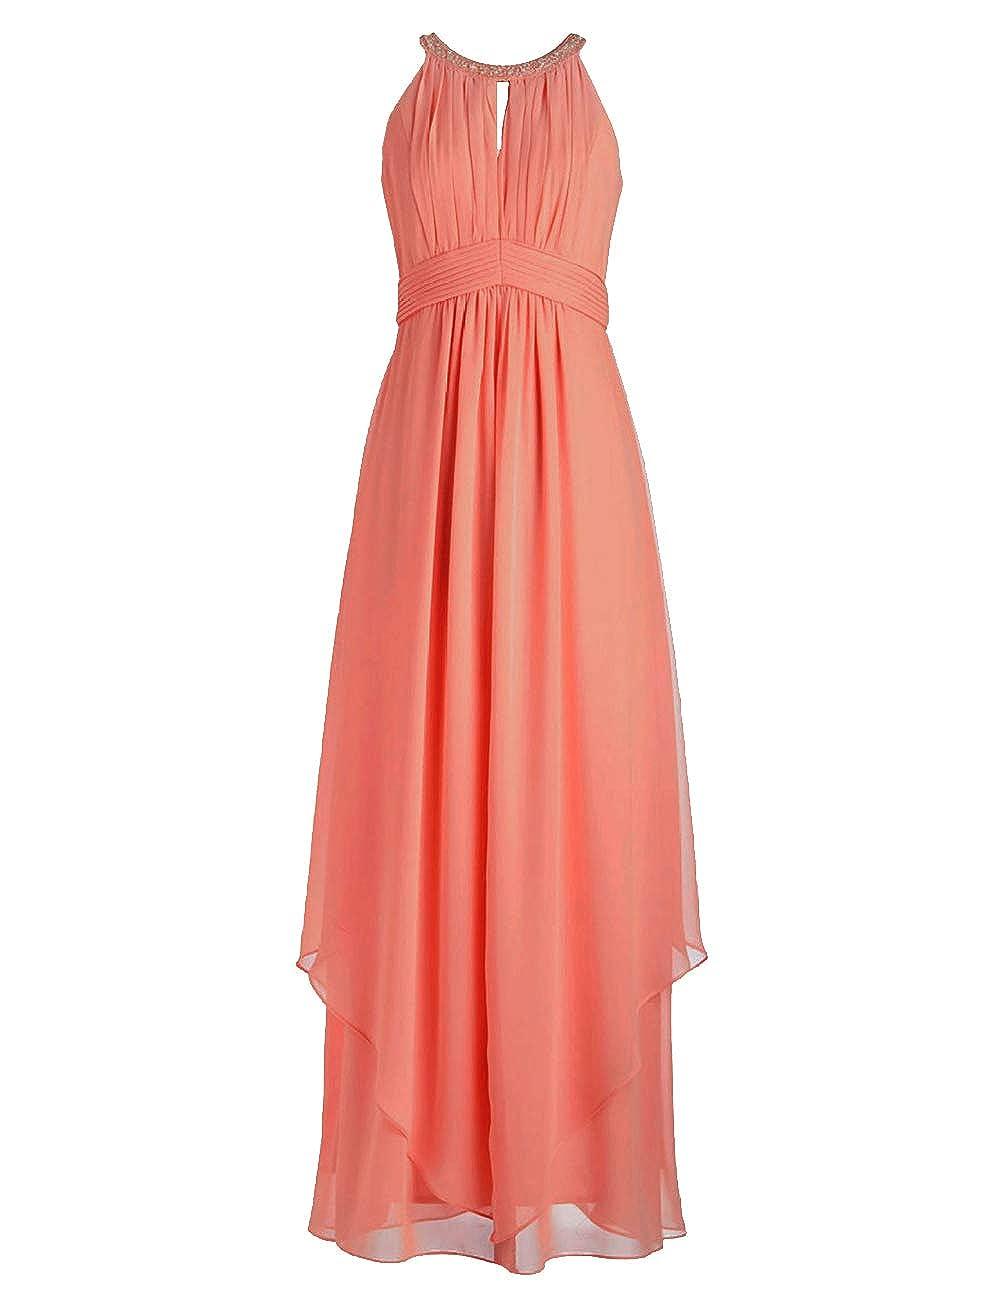 Peach Bridesmaid Dresses Halter Evening Party Dress Long Bridesmaid Gowns Ruffles